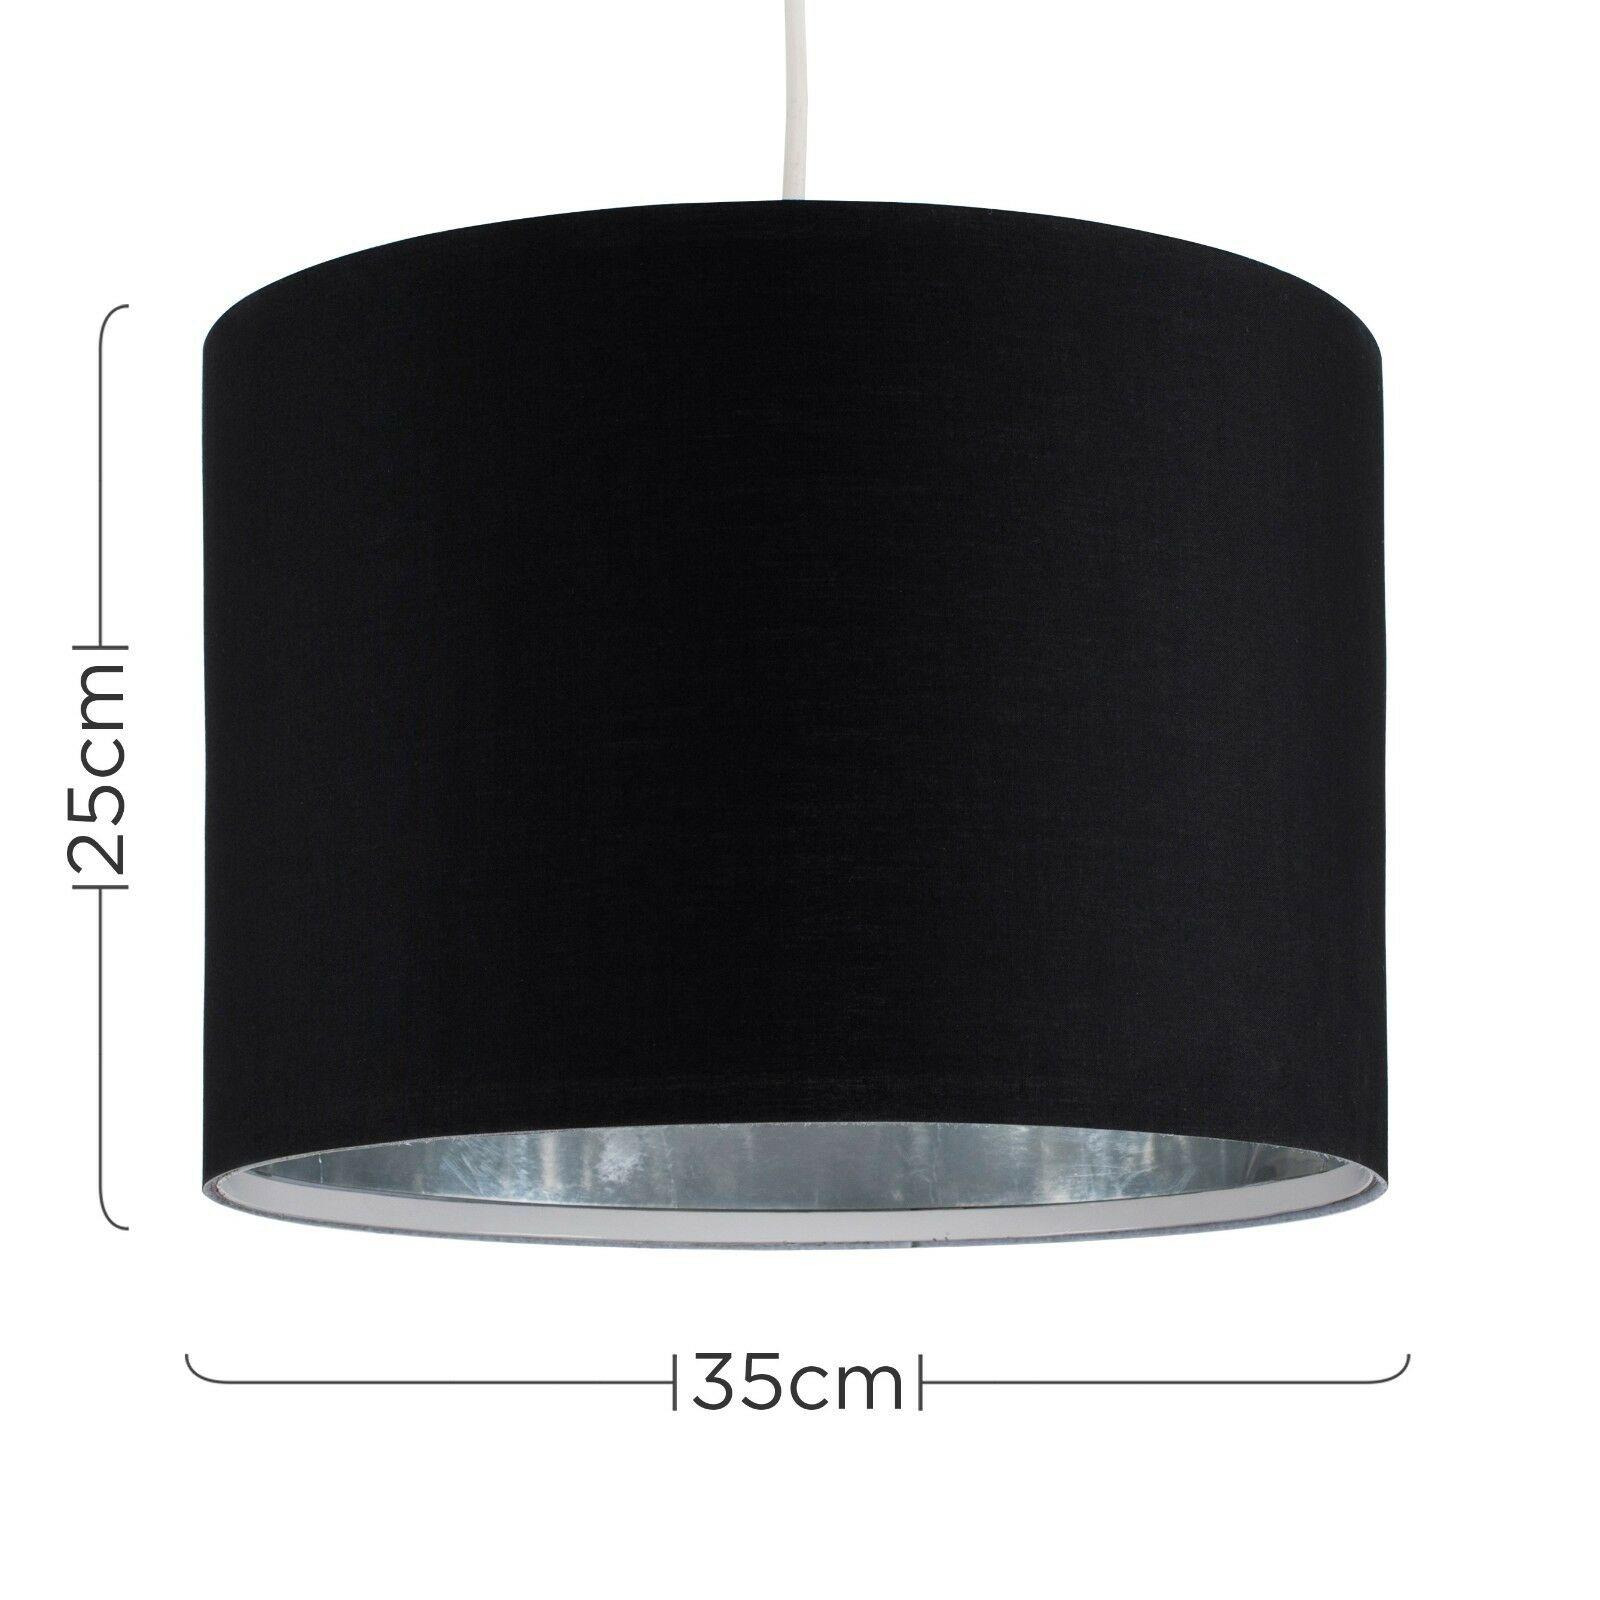 Tela-moderna-algodon-facil-ajuste-Techo-Colgante-Pantalla-De-Mesa-tonos-de-luz-de-tambor miniatura 26